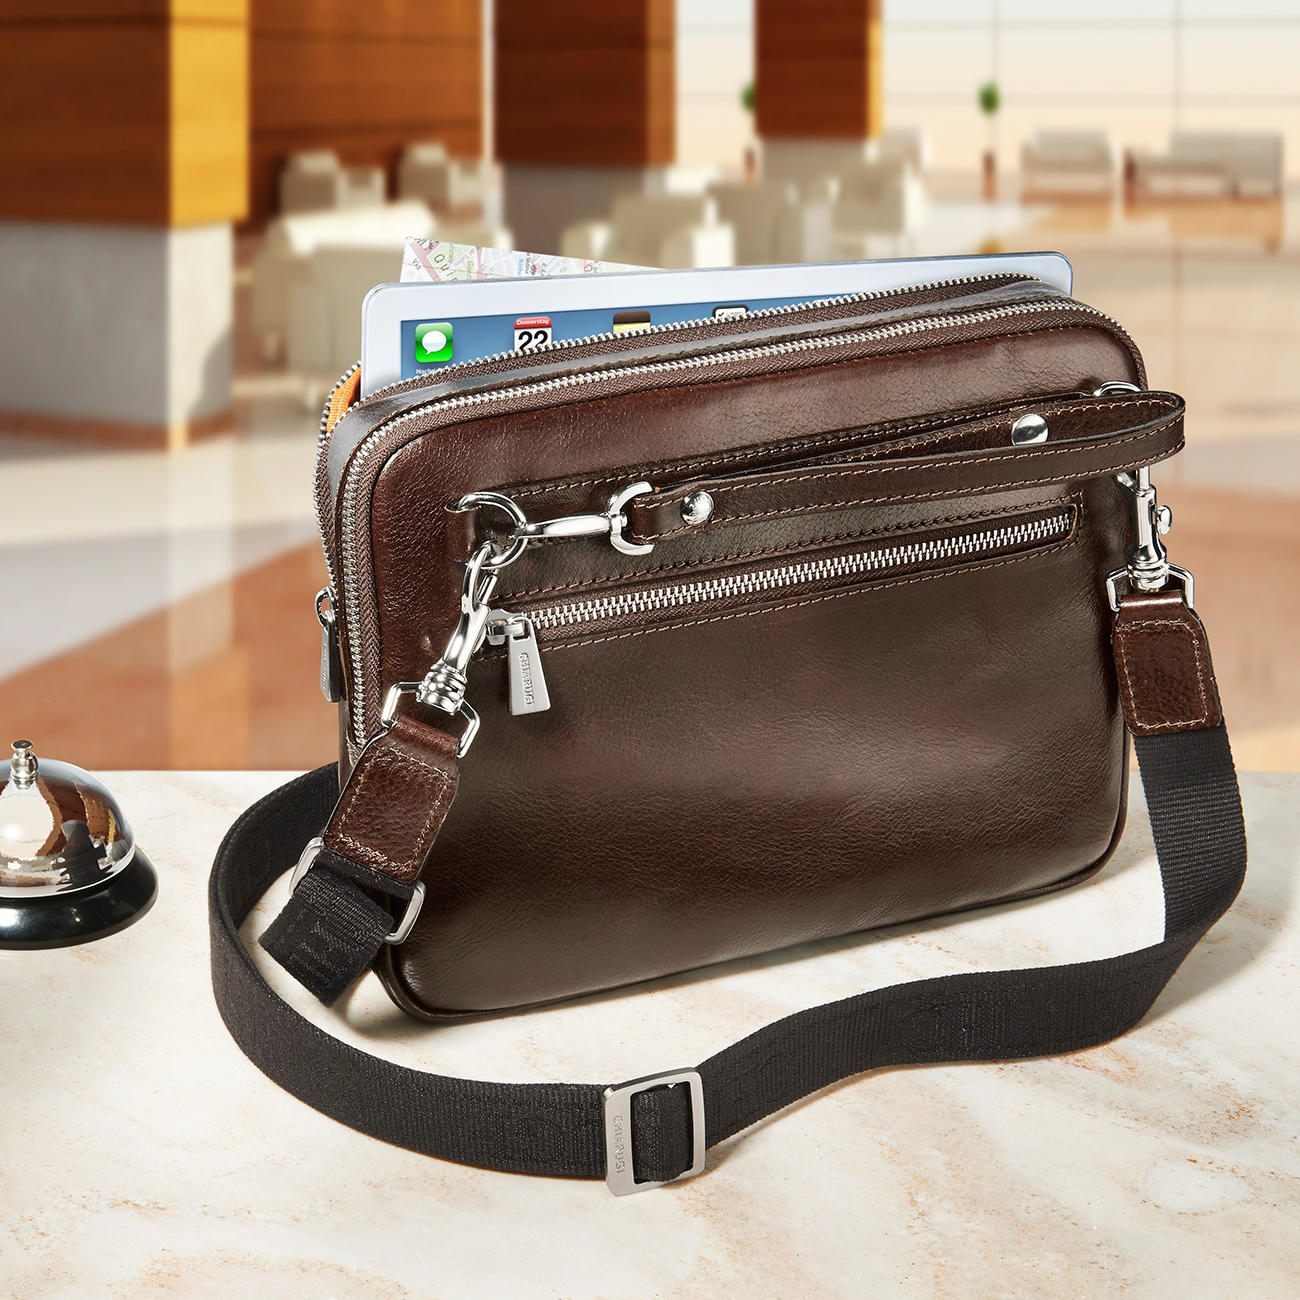 7dcd9a98e934e Bag3 Pro Idee Personal Garantie Chiarugi Jahre by76fg